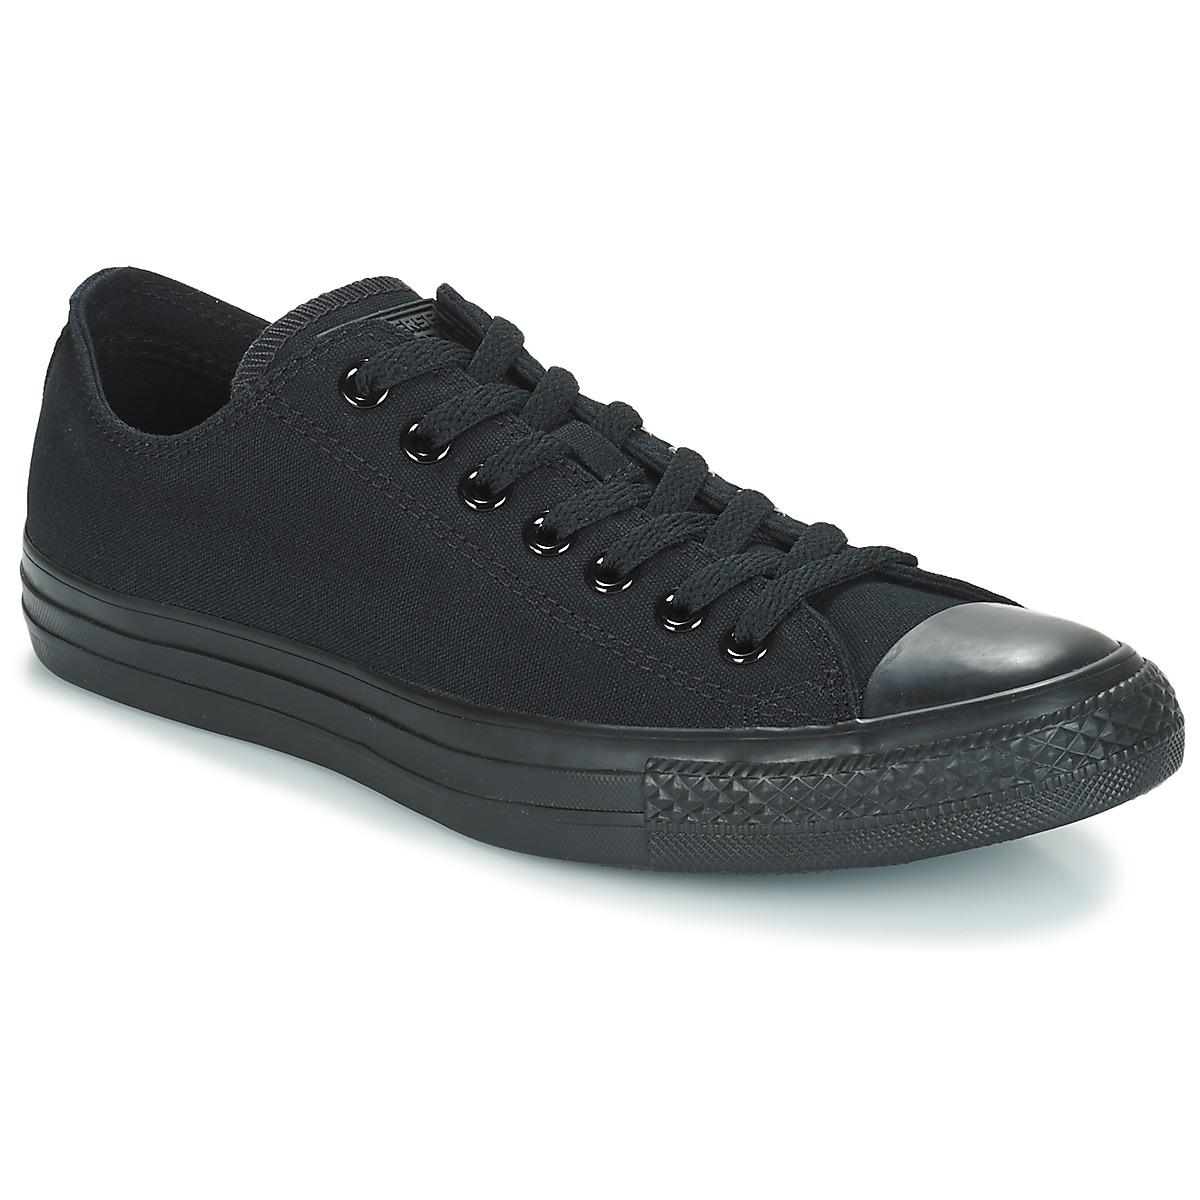 Converse CHUCK TAYLOR ALL STAR MONO OX Schwarz - Kostenloser Versand bei Spartoode ! - Schuhe Sneaker Low  51,99 €